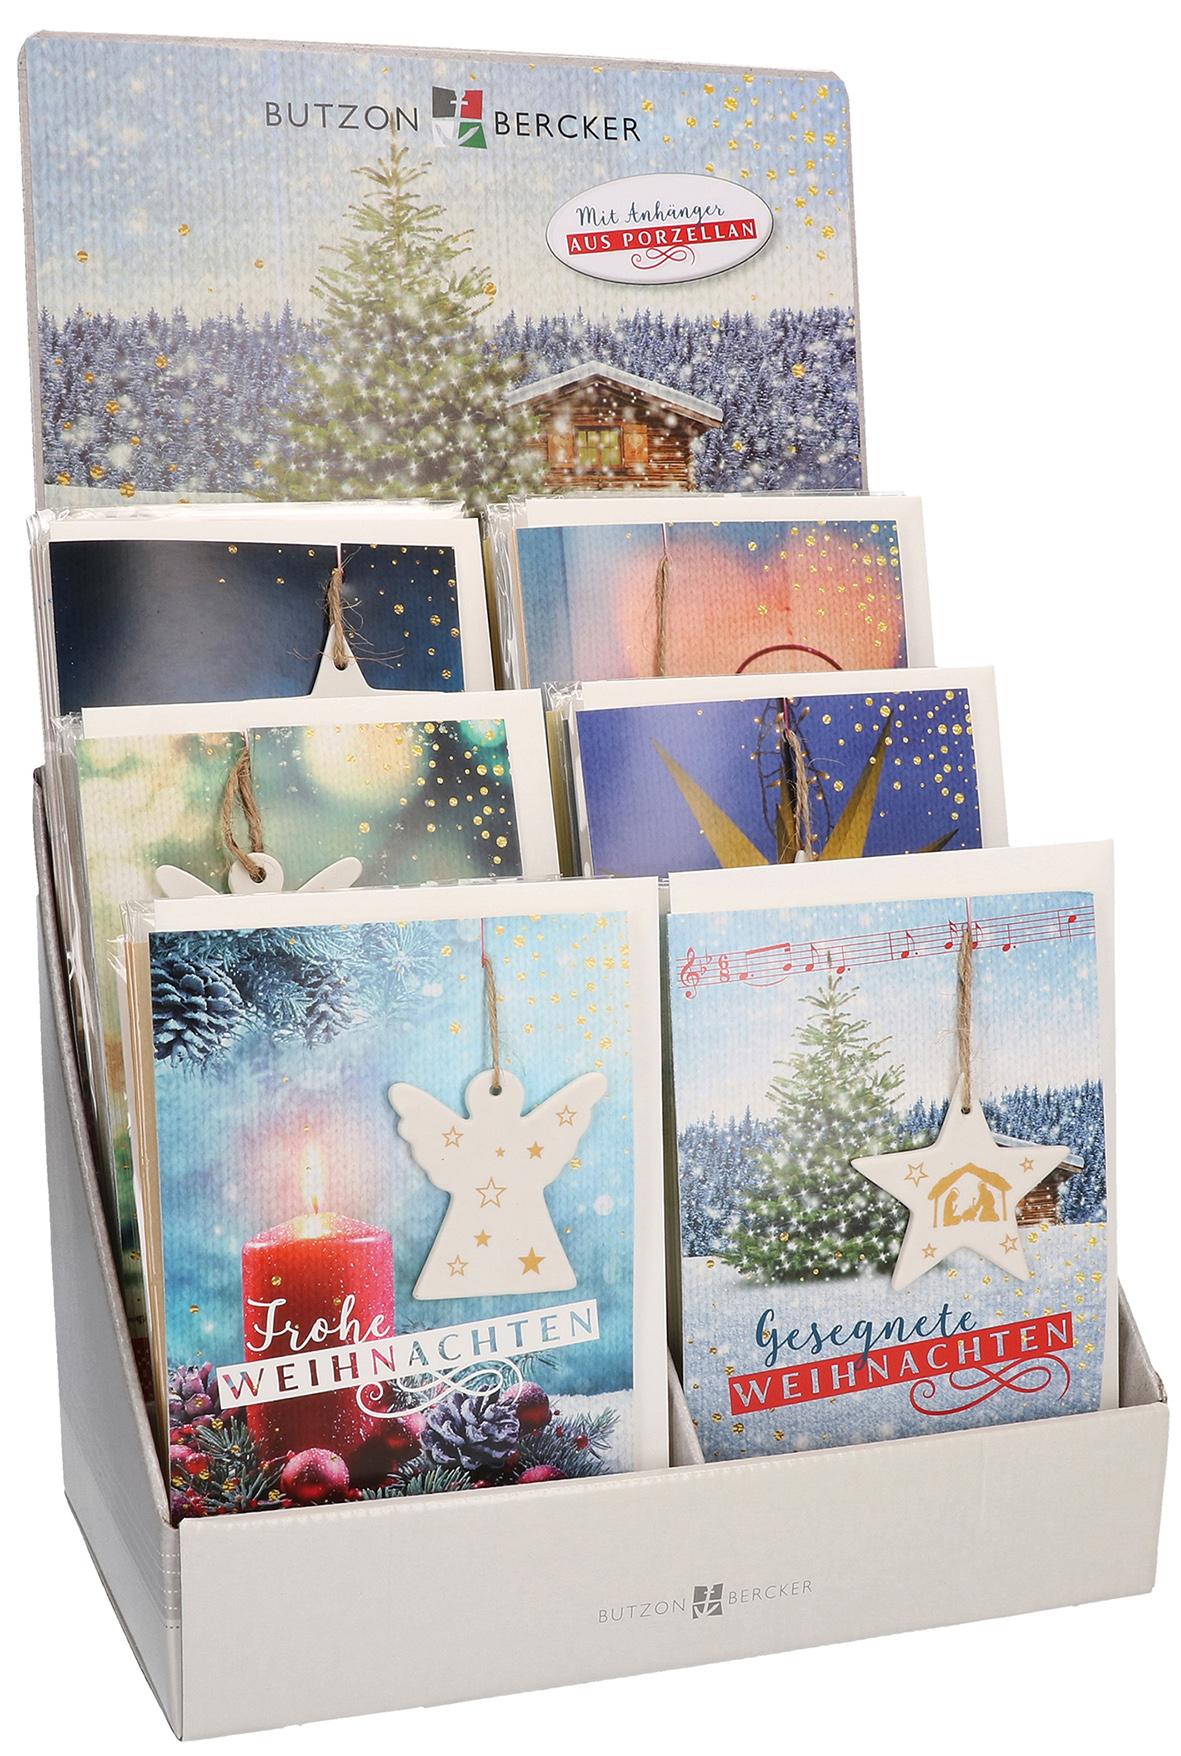 display weihnachtskarten mit porzellan anh nger. Black Bedroom Furniture Sets. Home Design Ideas